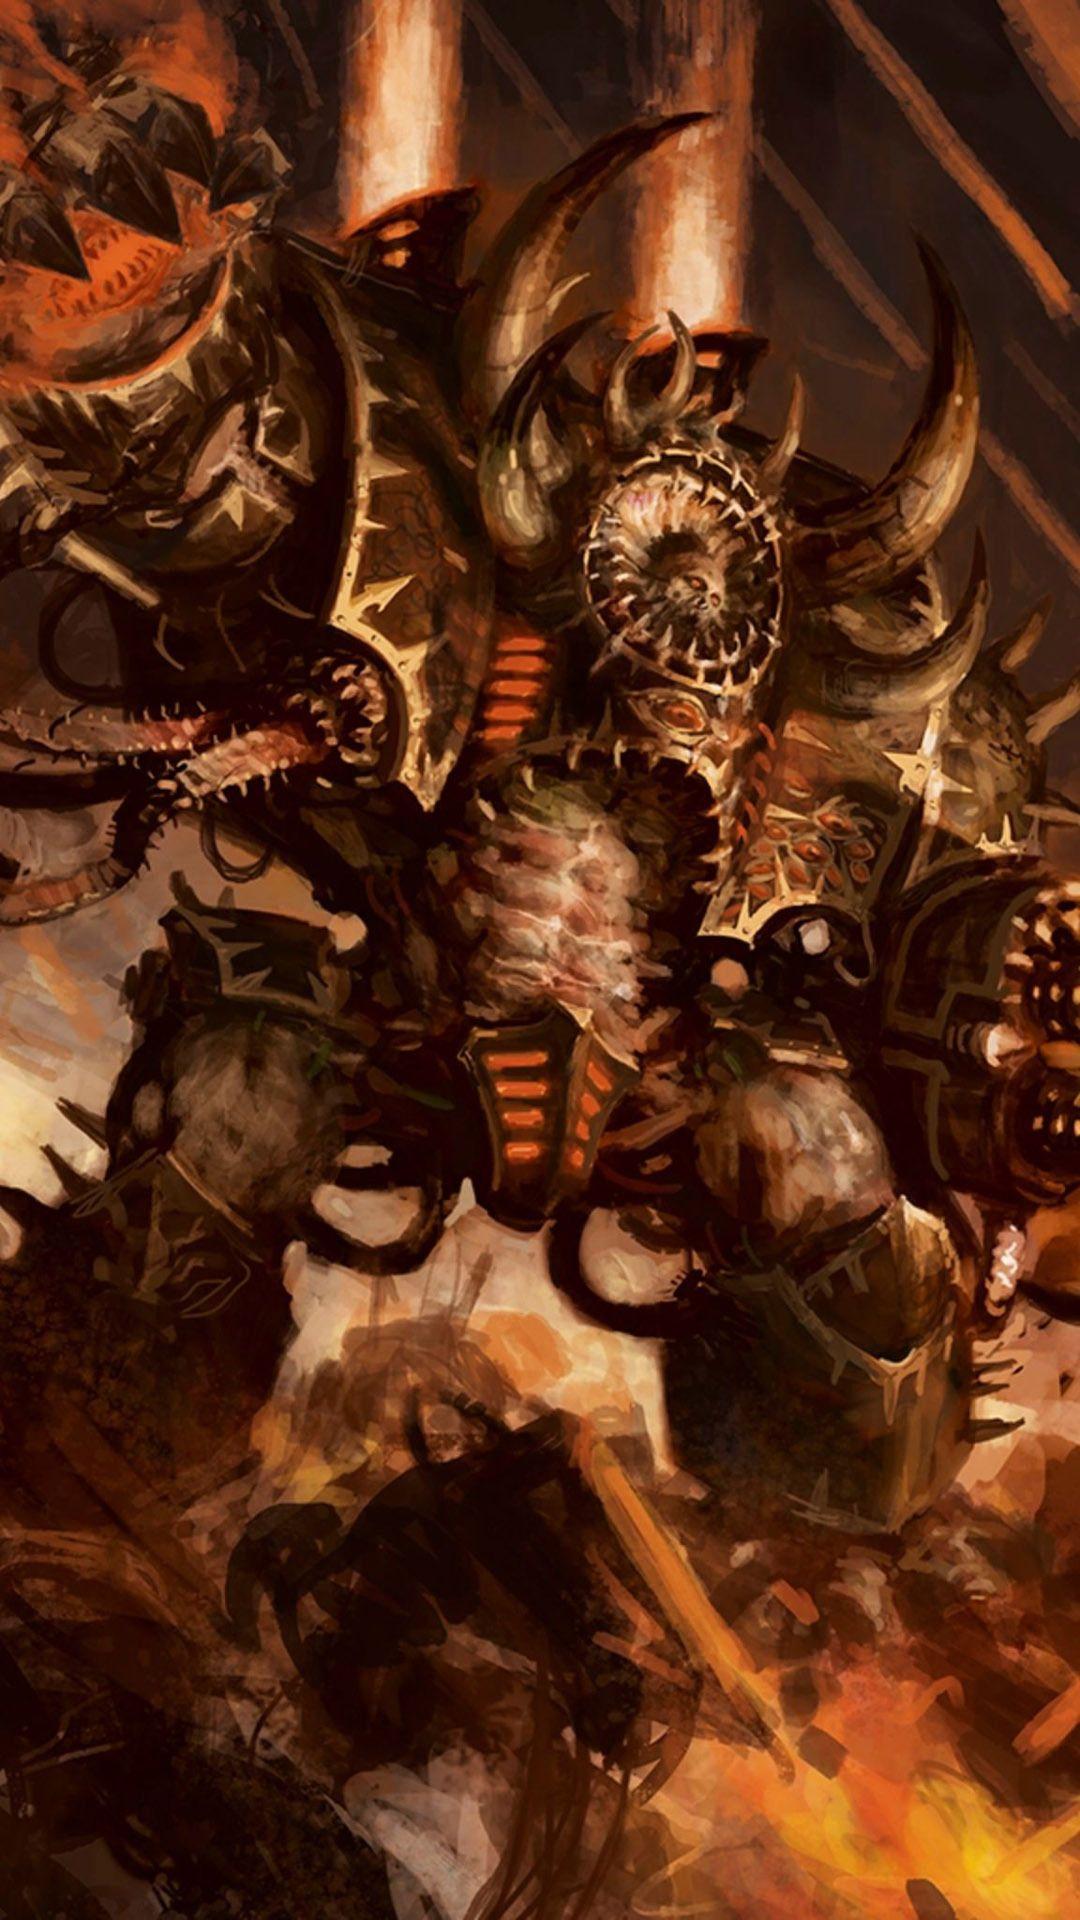 X1 Helbrute MORTIS metalikus Oscura Vendetta Chaos Space Marines WARHAMMER 40k #2